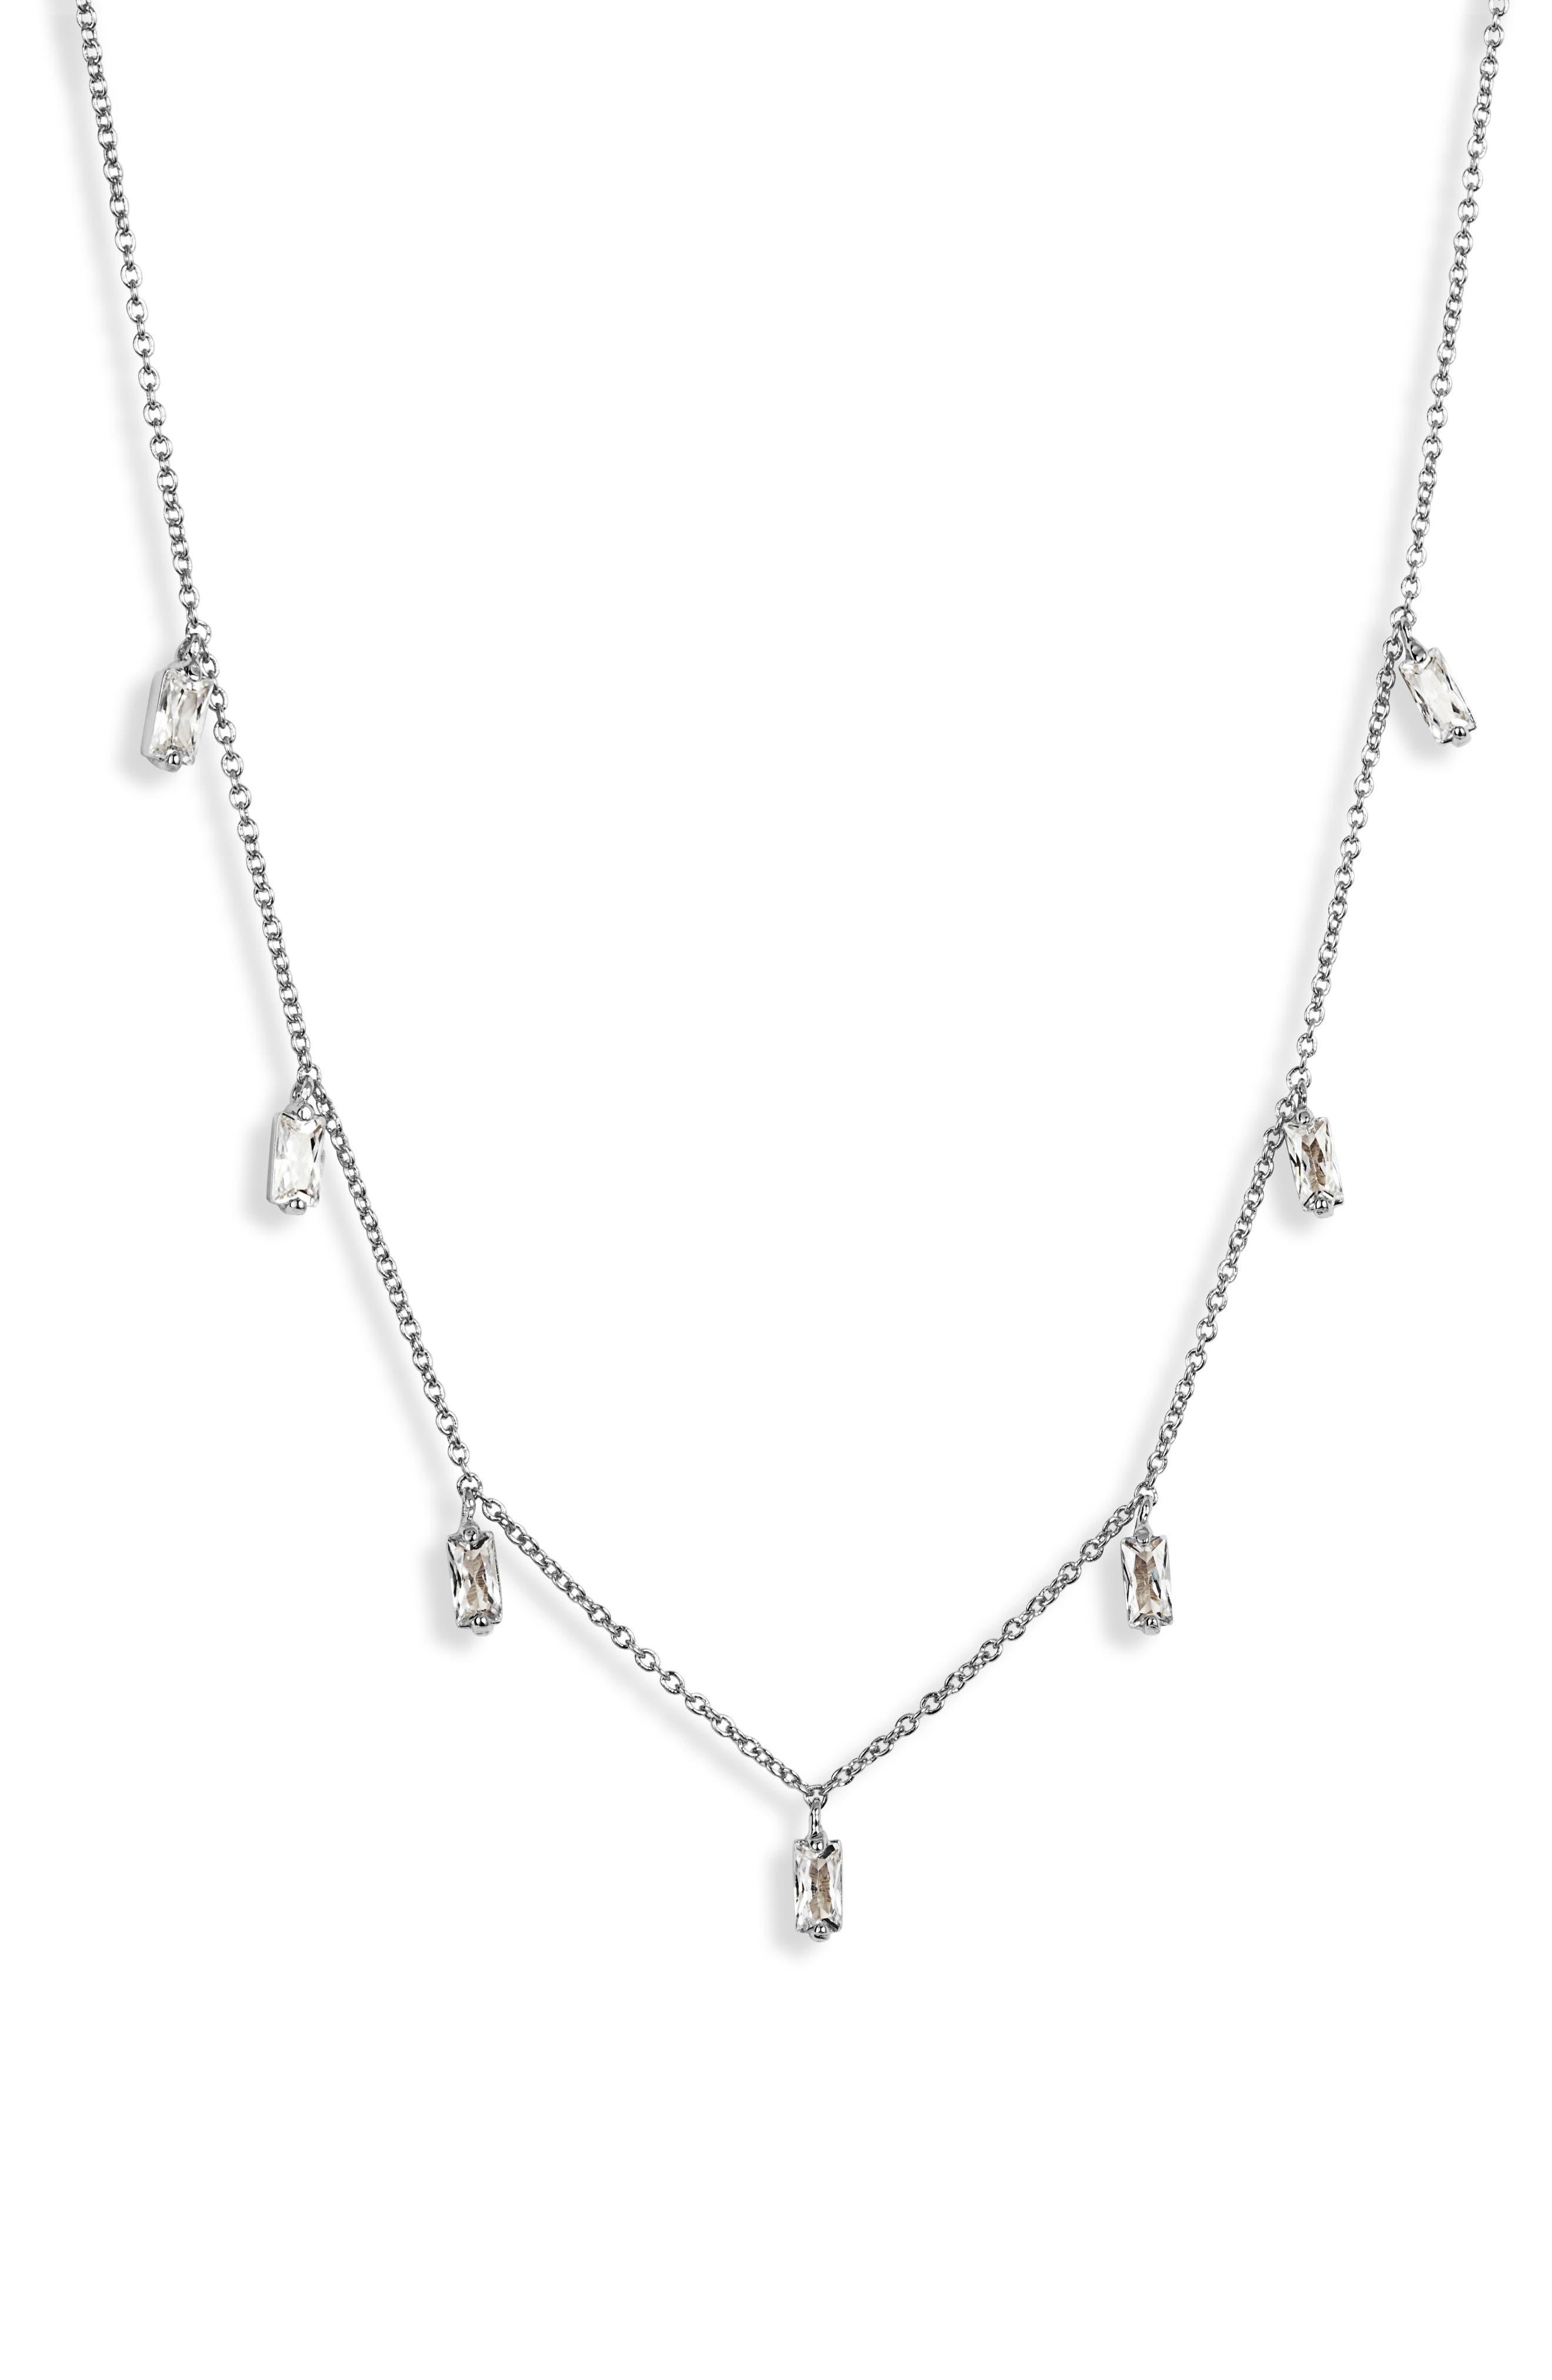 Amara Crystal Fringe Necklace,                             Main thumbnail 1, color,                             SILVER